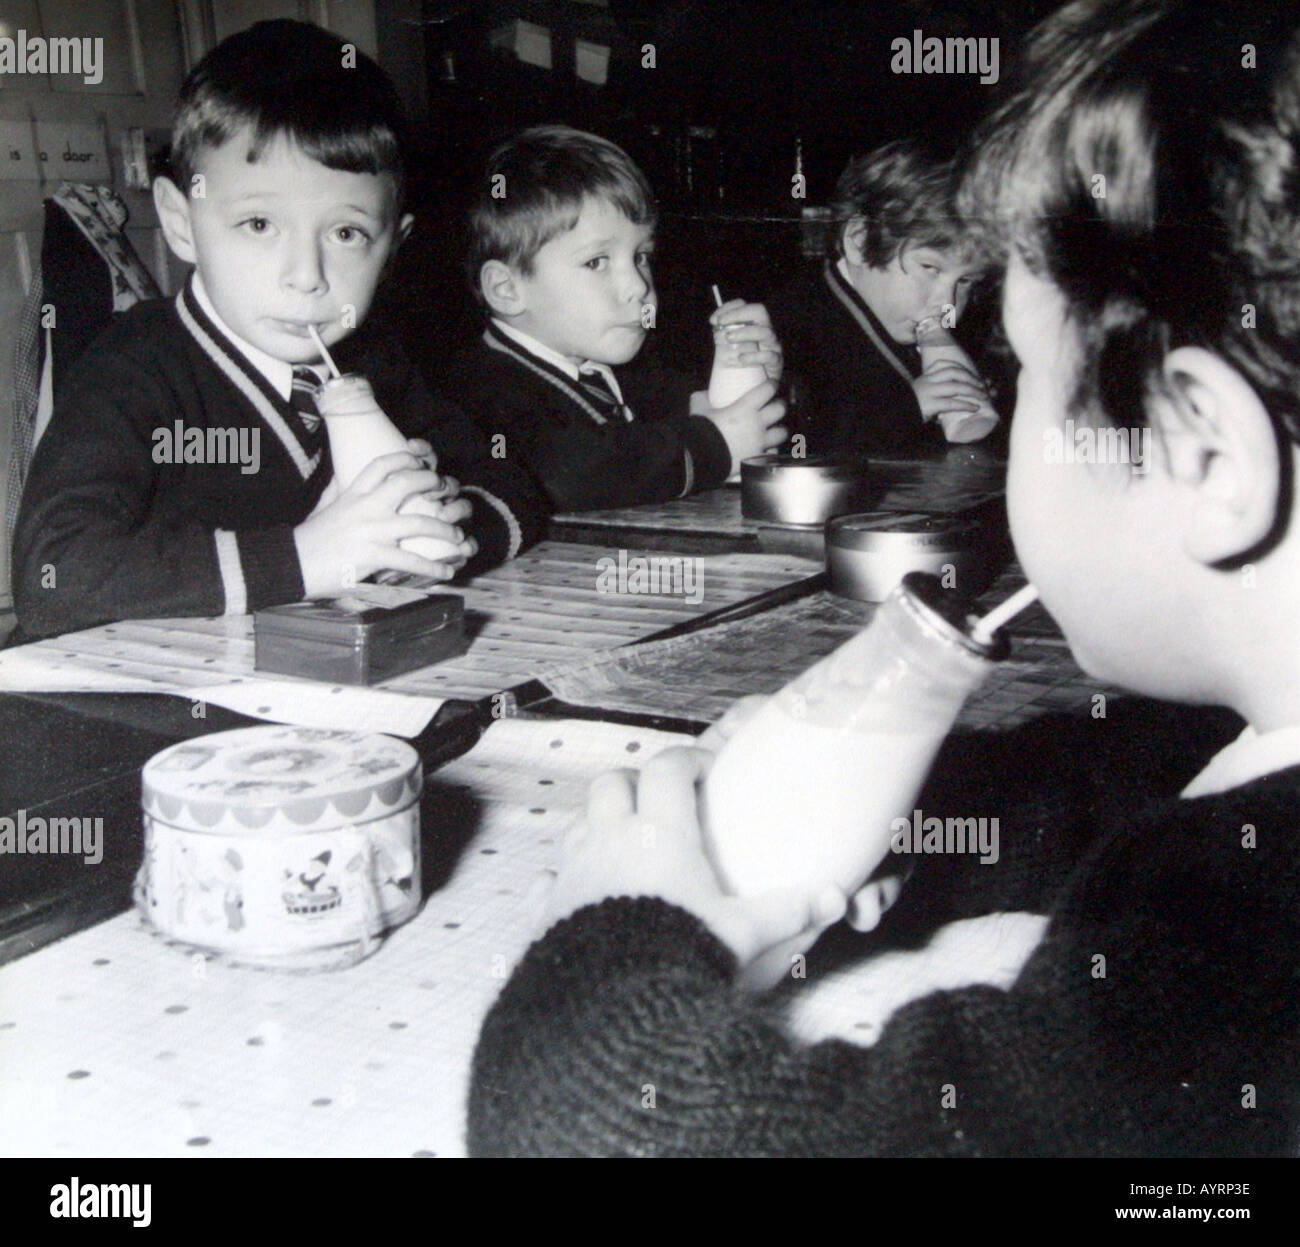 prmary school children having a free milk break in 1959 - Stock Image